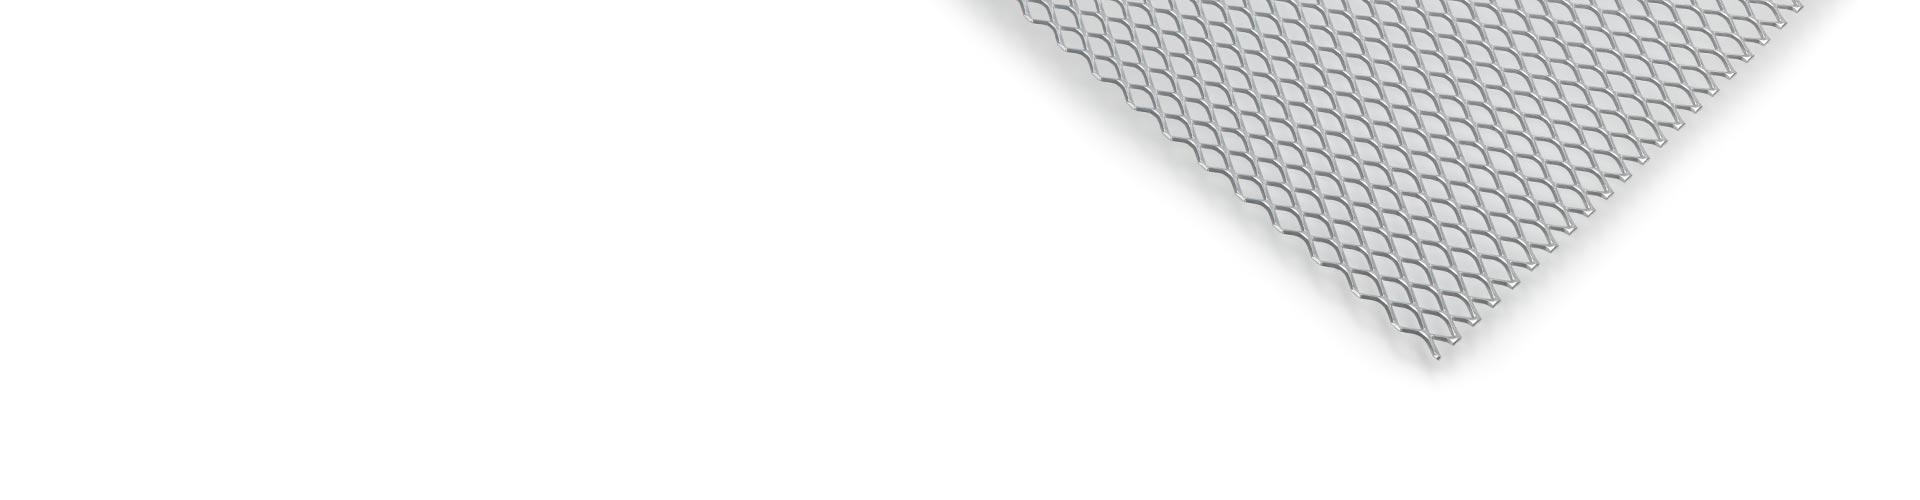 Streckmetall mit Rautenlöchern – perfolinea.de